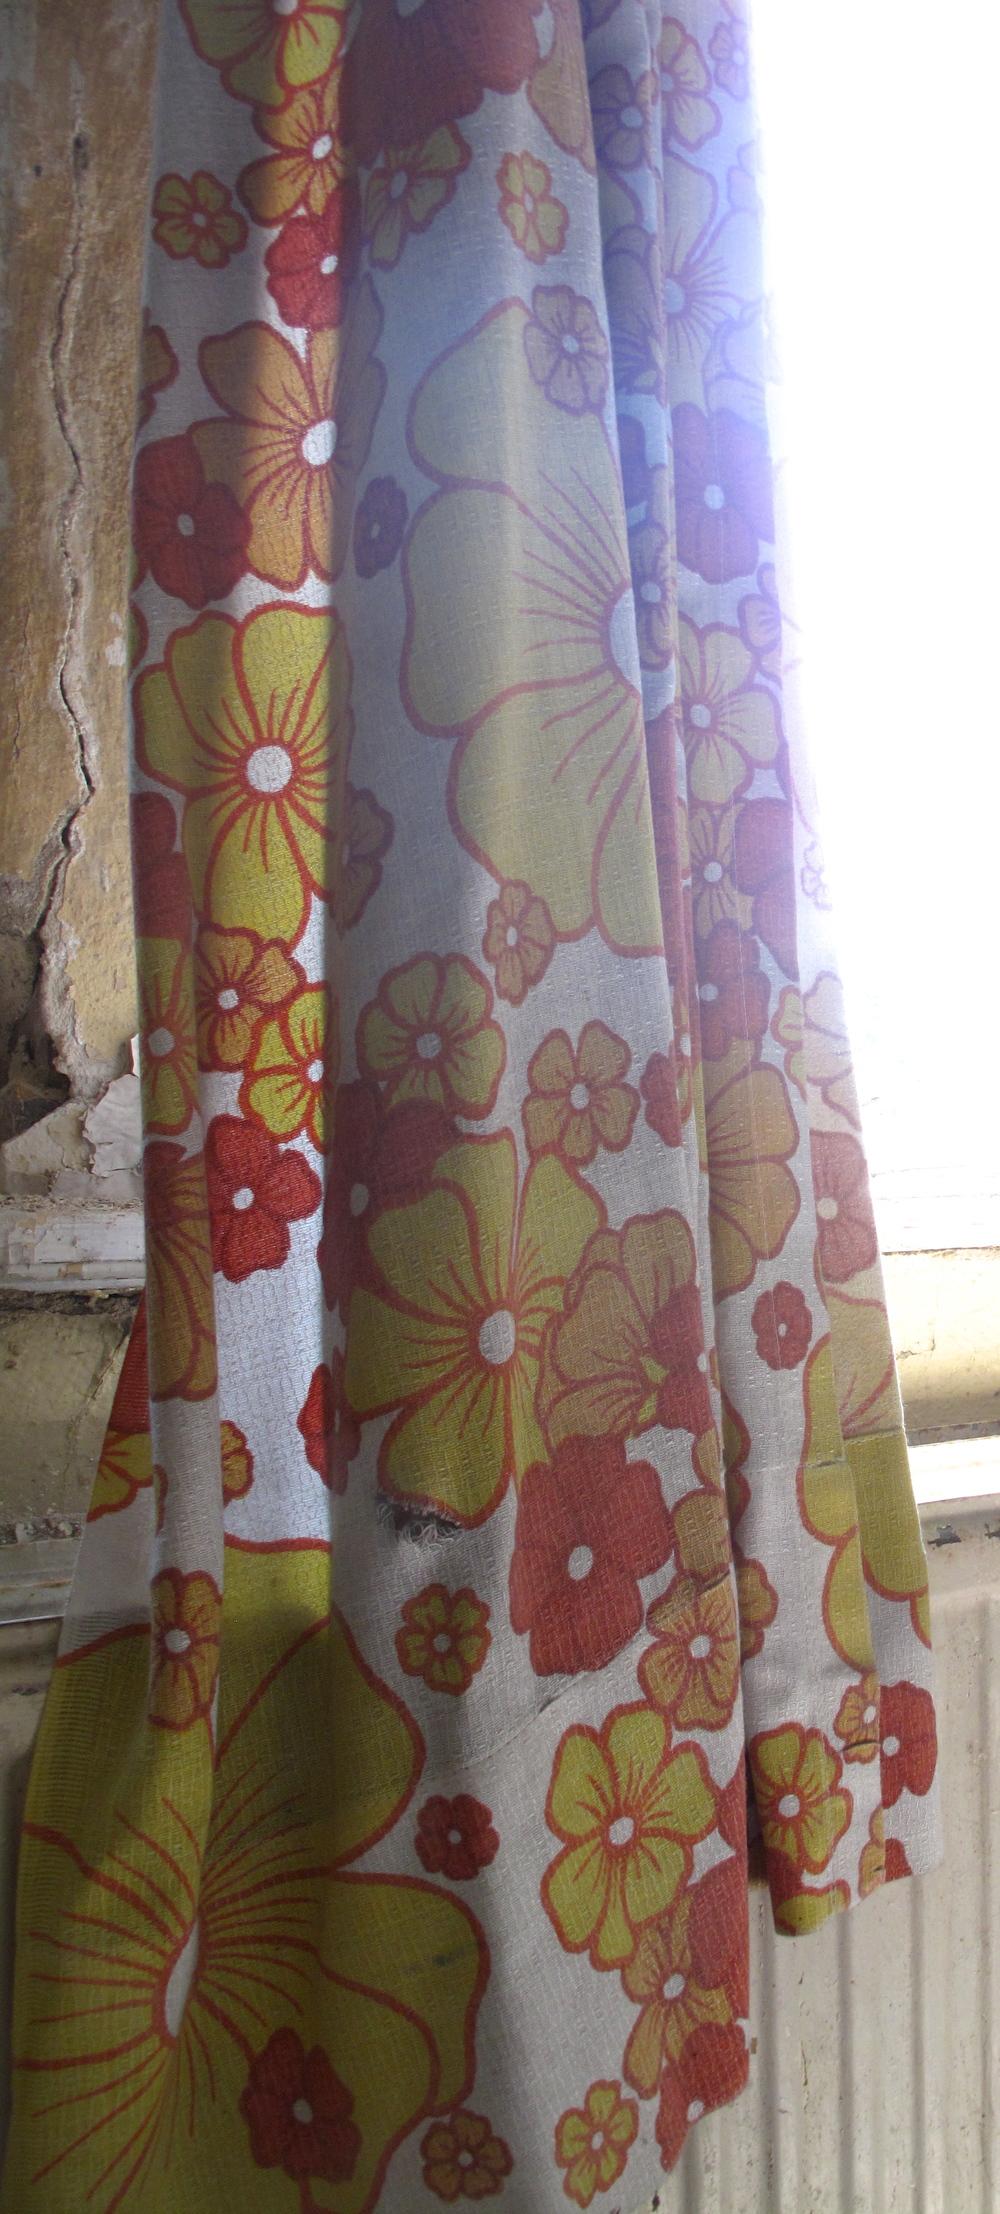 Curtains fluttering in the wind - with a 60's orange flower pattern, Elisabeth Sanatorium